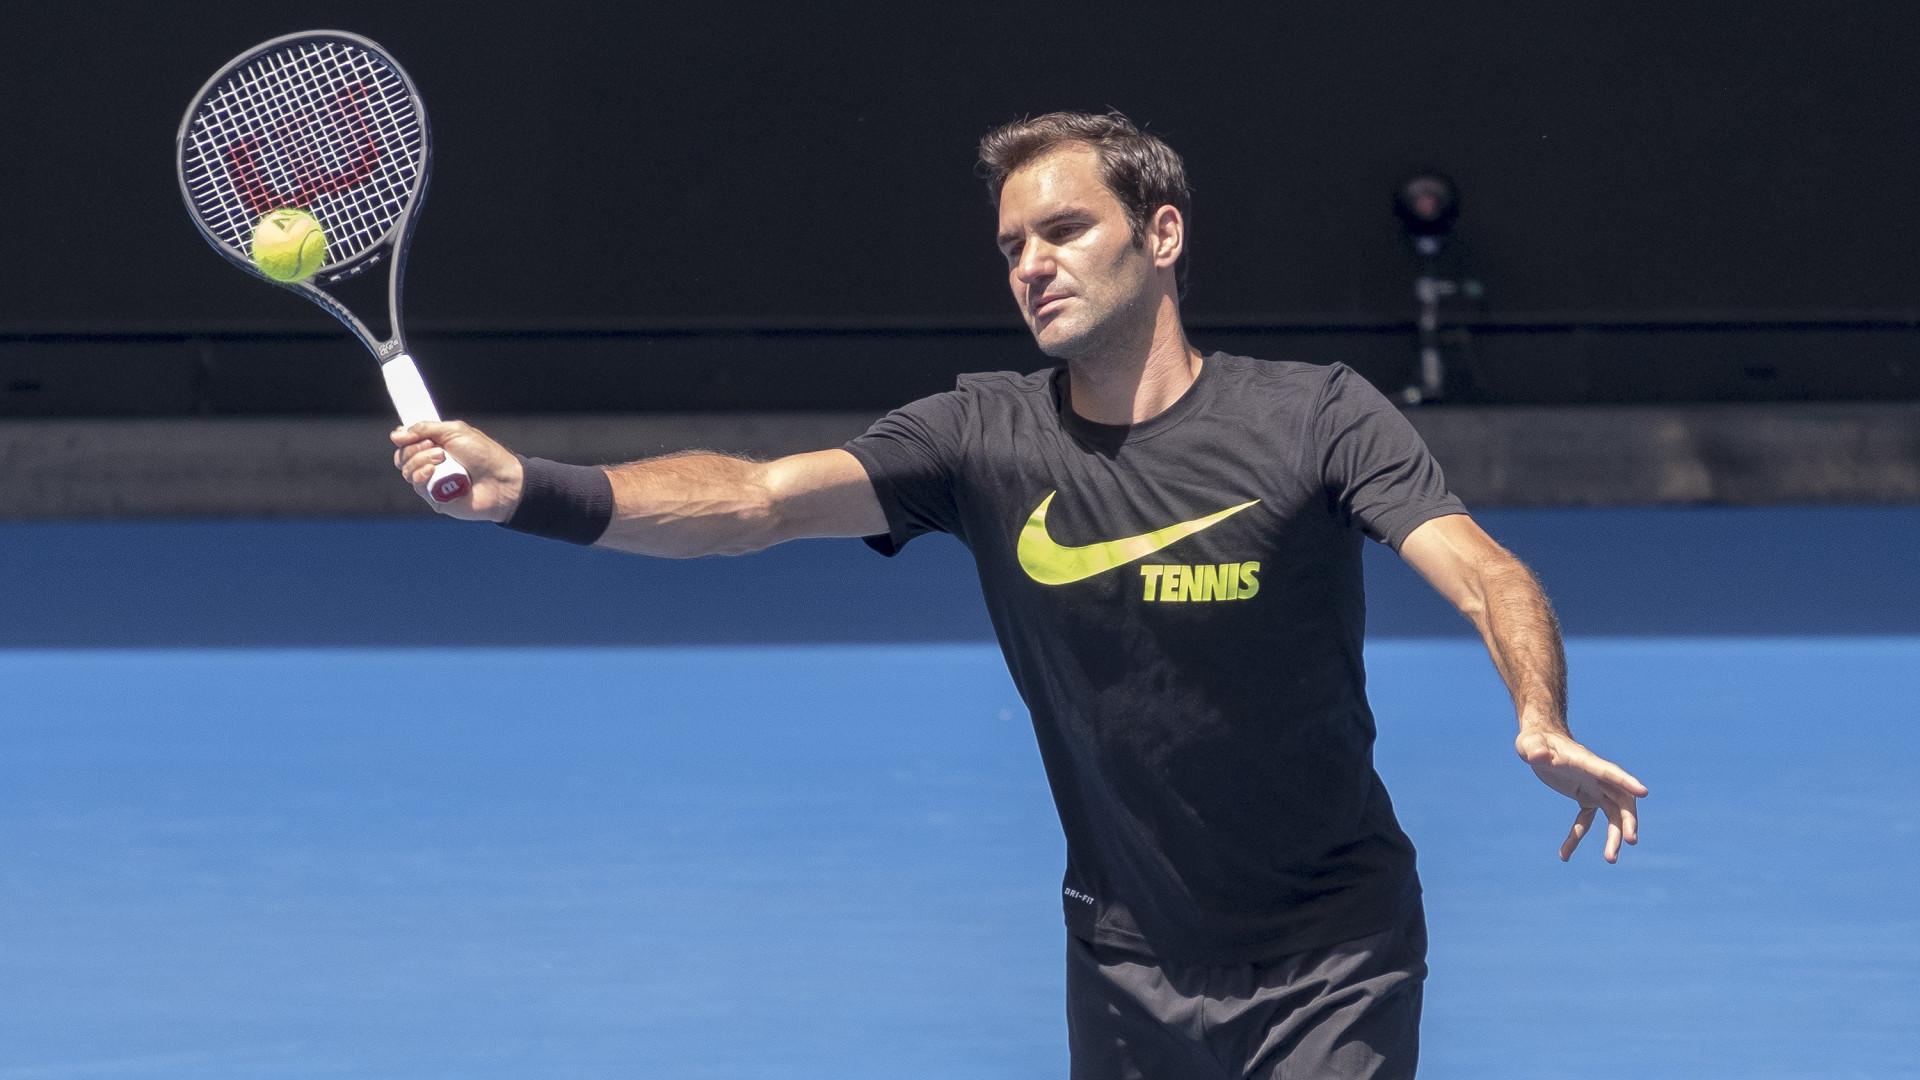 Roger Federer e Rafael Nadal de novo favoritos no Open da Austrália